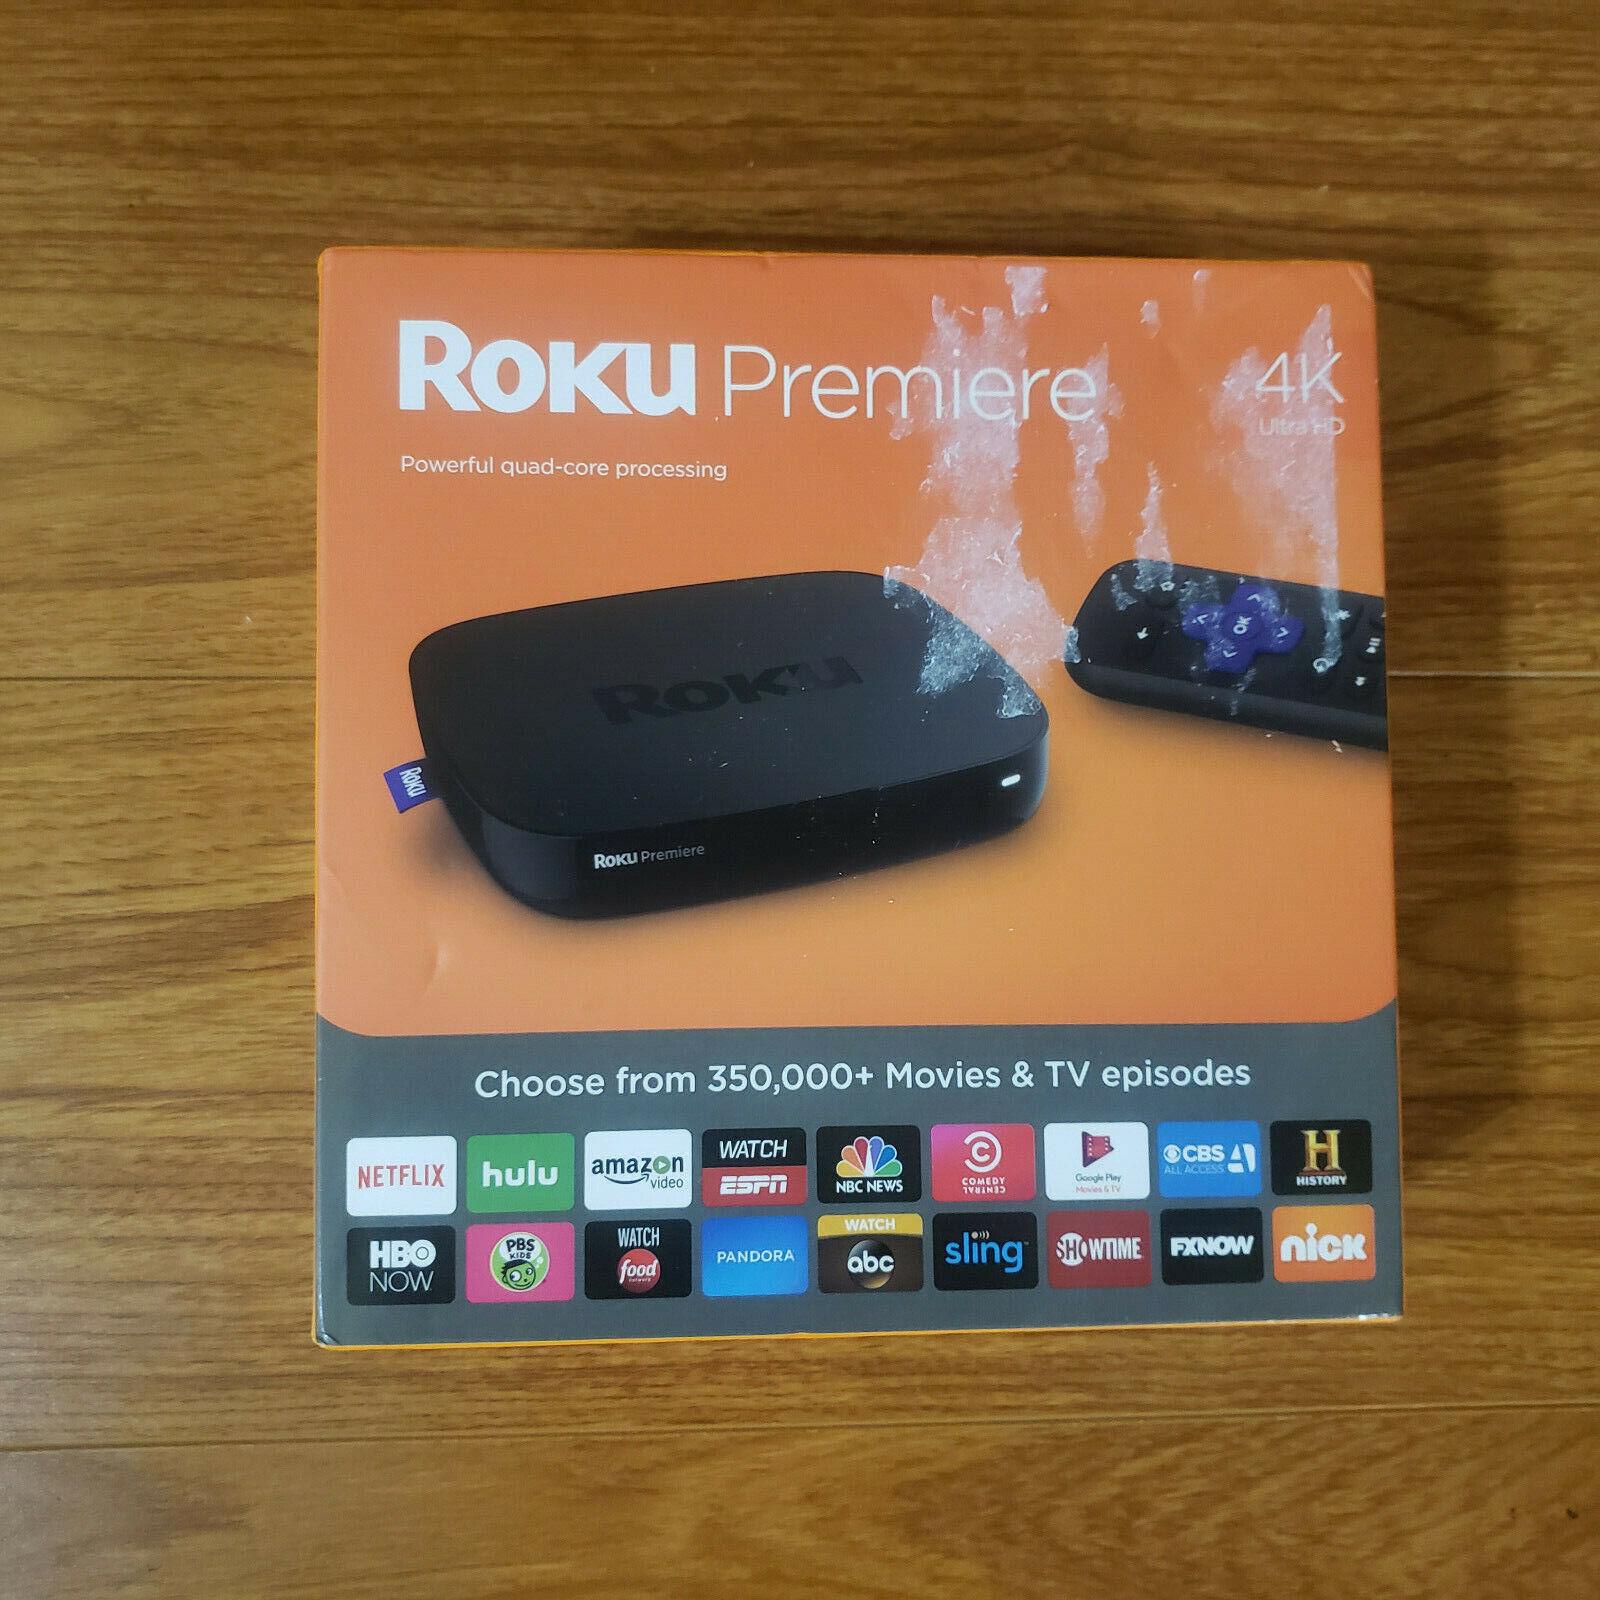 Brand New Roku Premiere 4K Ultra HD Streaming Media Player 4620R 4620r brand media new player premiere roku streaming ultra